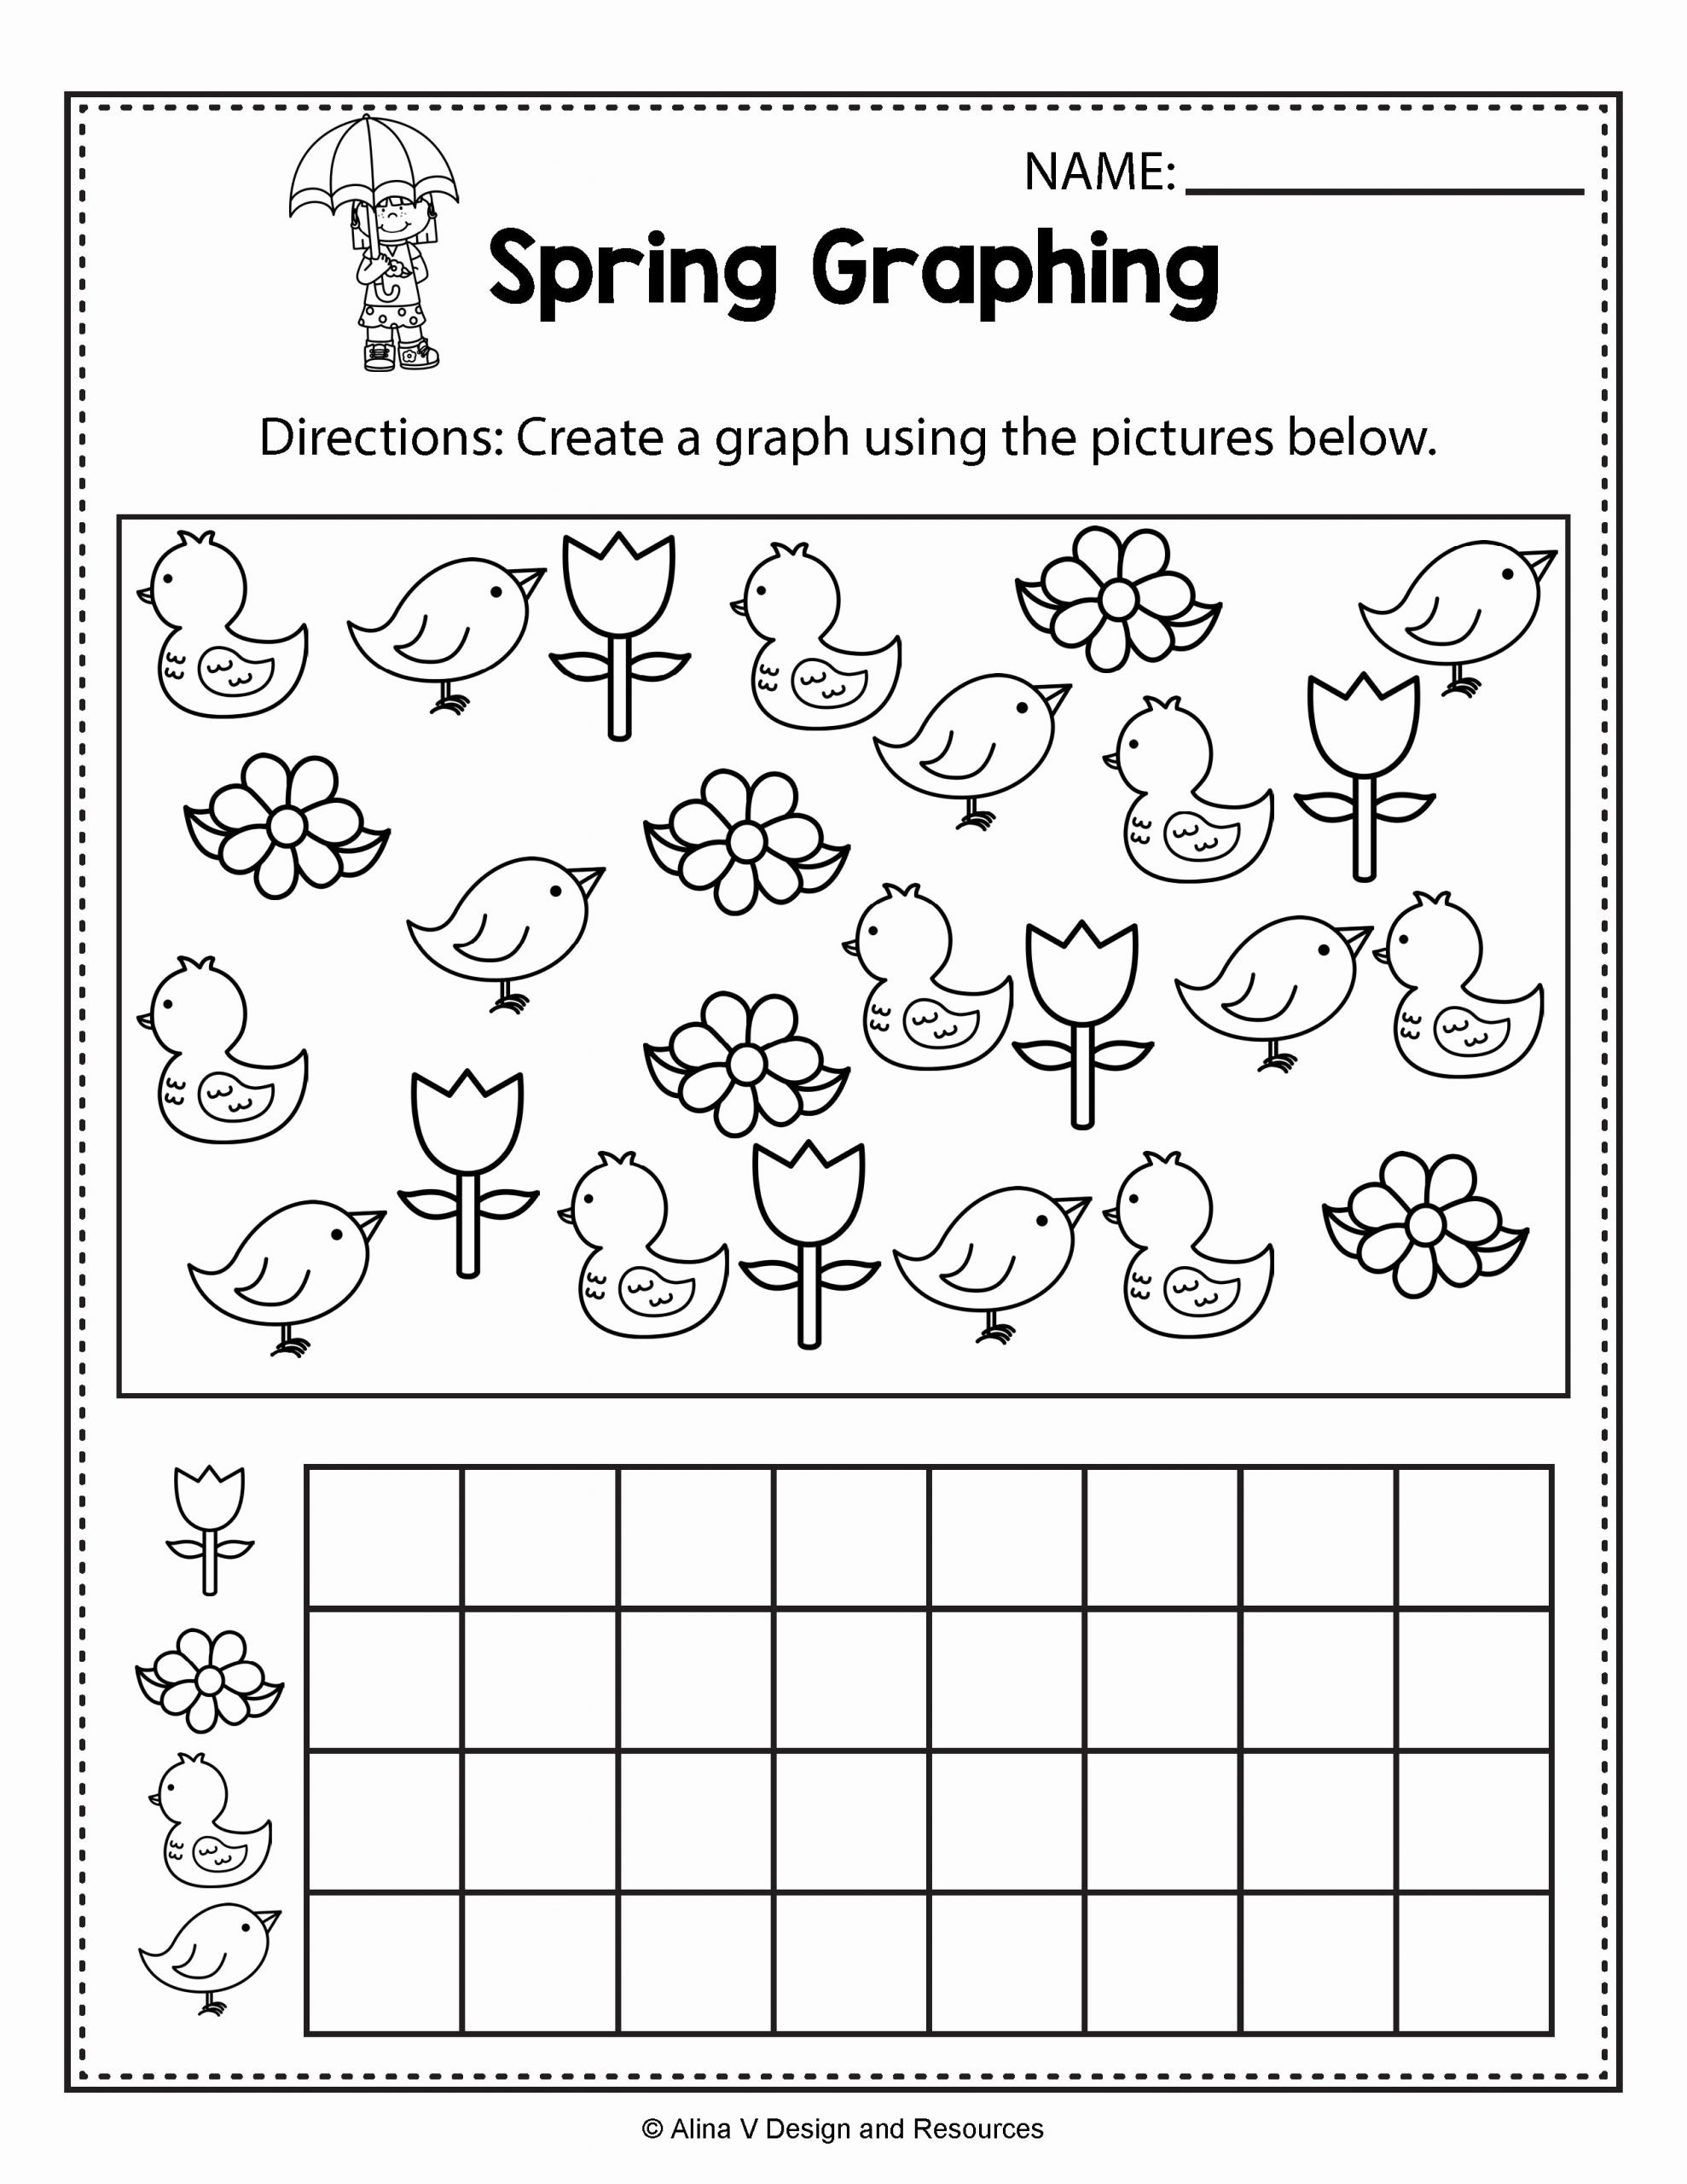 Spring Math Worksheets for Preschoolers Fresh Spring Graphing Spring Math Worksheets and Activities for